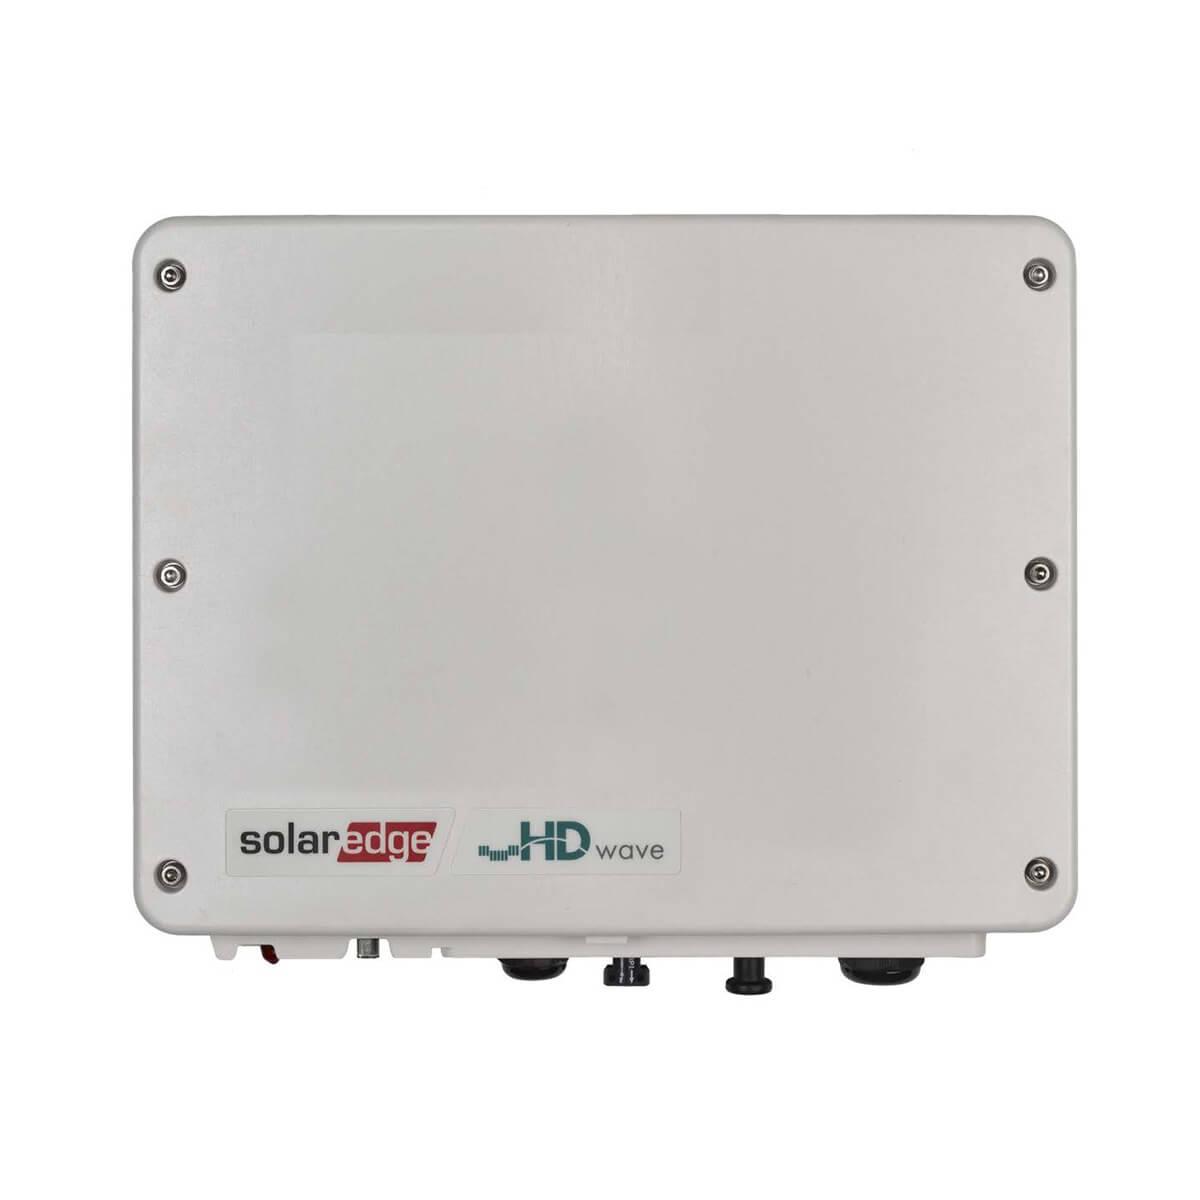 solaredge 4kW inverter, solaredge se4000h 4kW inverter, solaredge se4000h inverter, solaredge se4000h, solaredge 4 kW, SOLAREDGE 4 KW